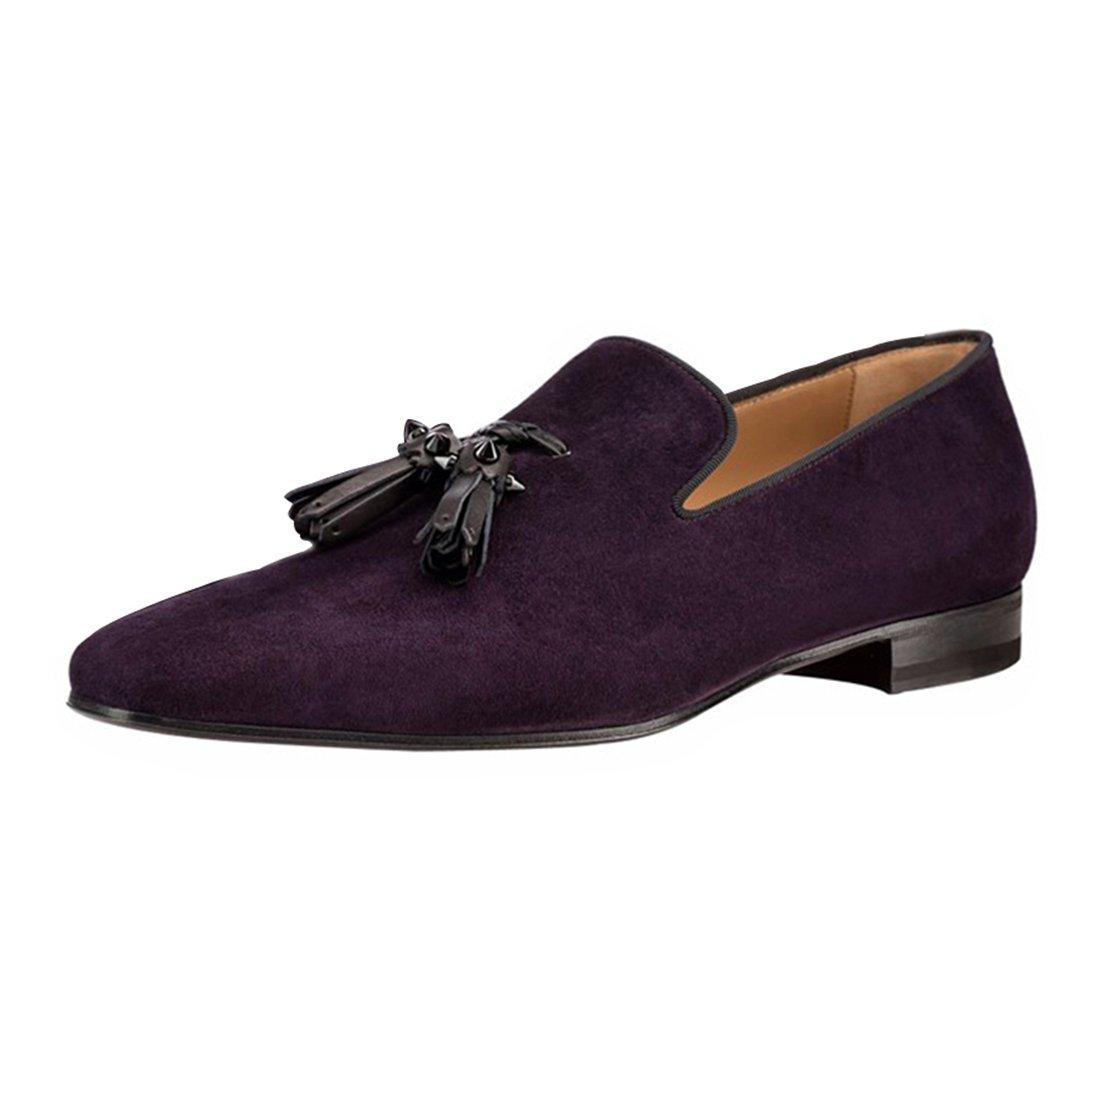 Slip On Dress Shoes Business Tassels Loafers For Men Purple US10.5